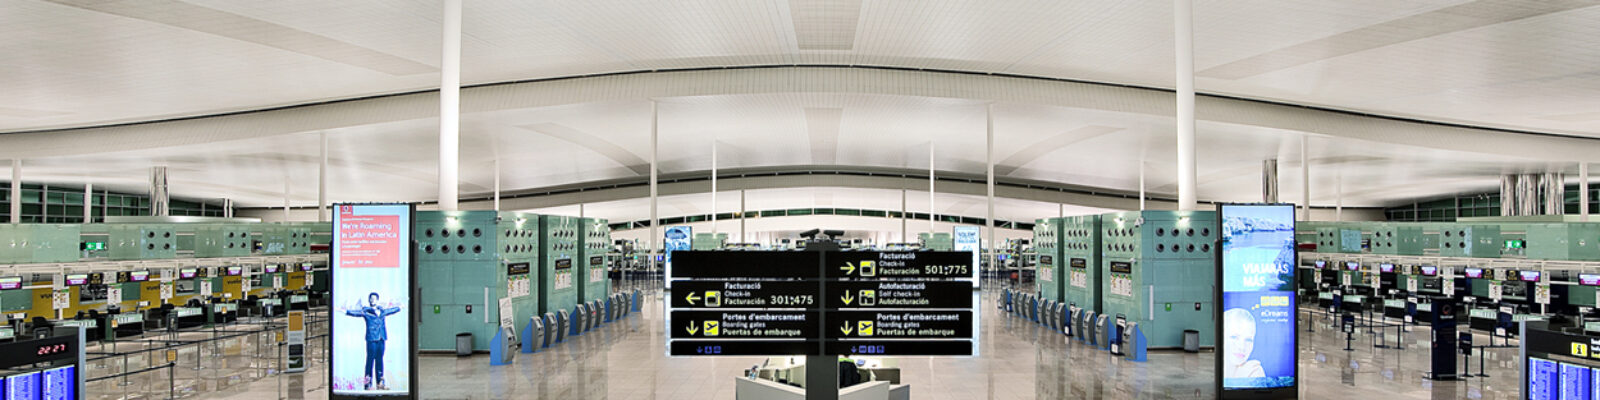 Internal view of El Prat airport in Barcelona